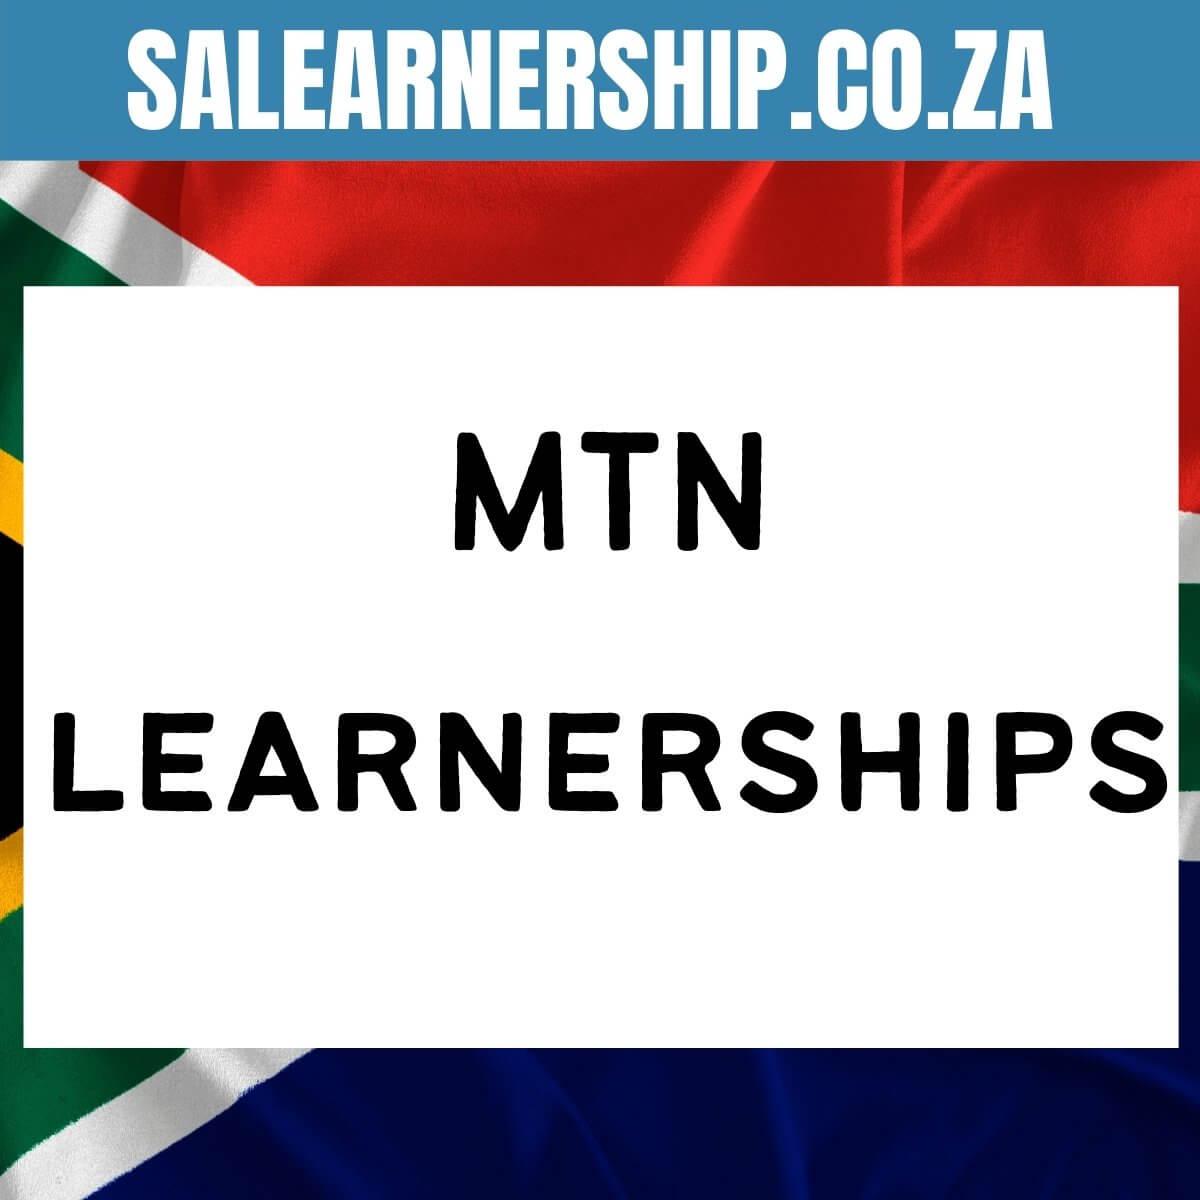 MTN learnerships